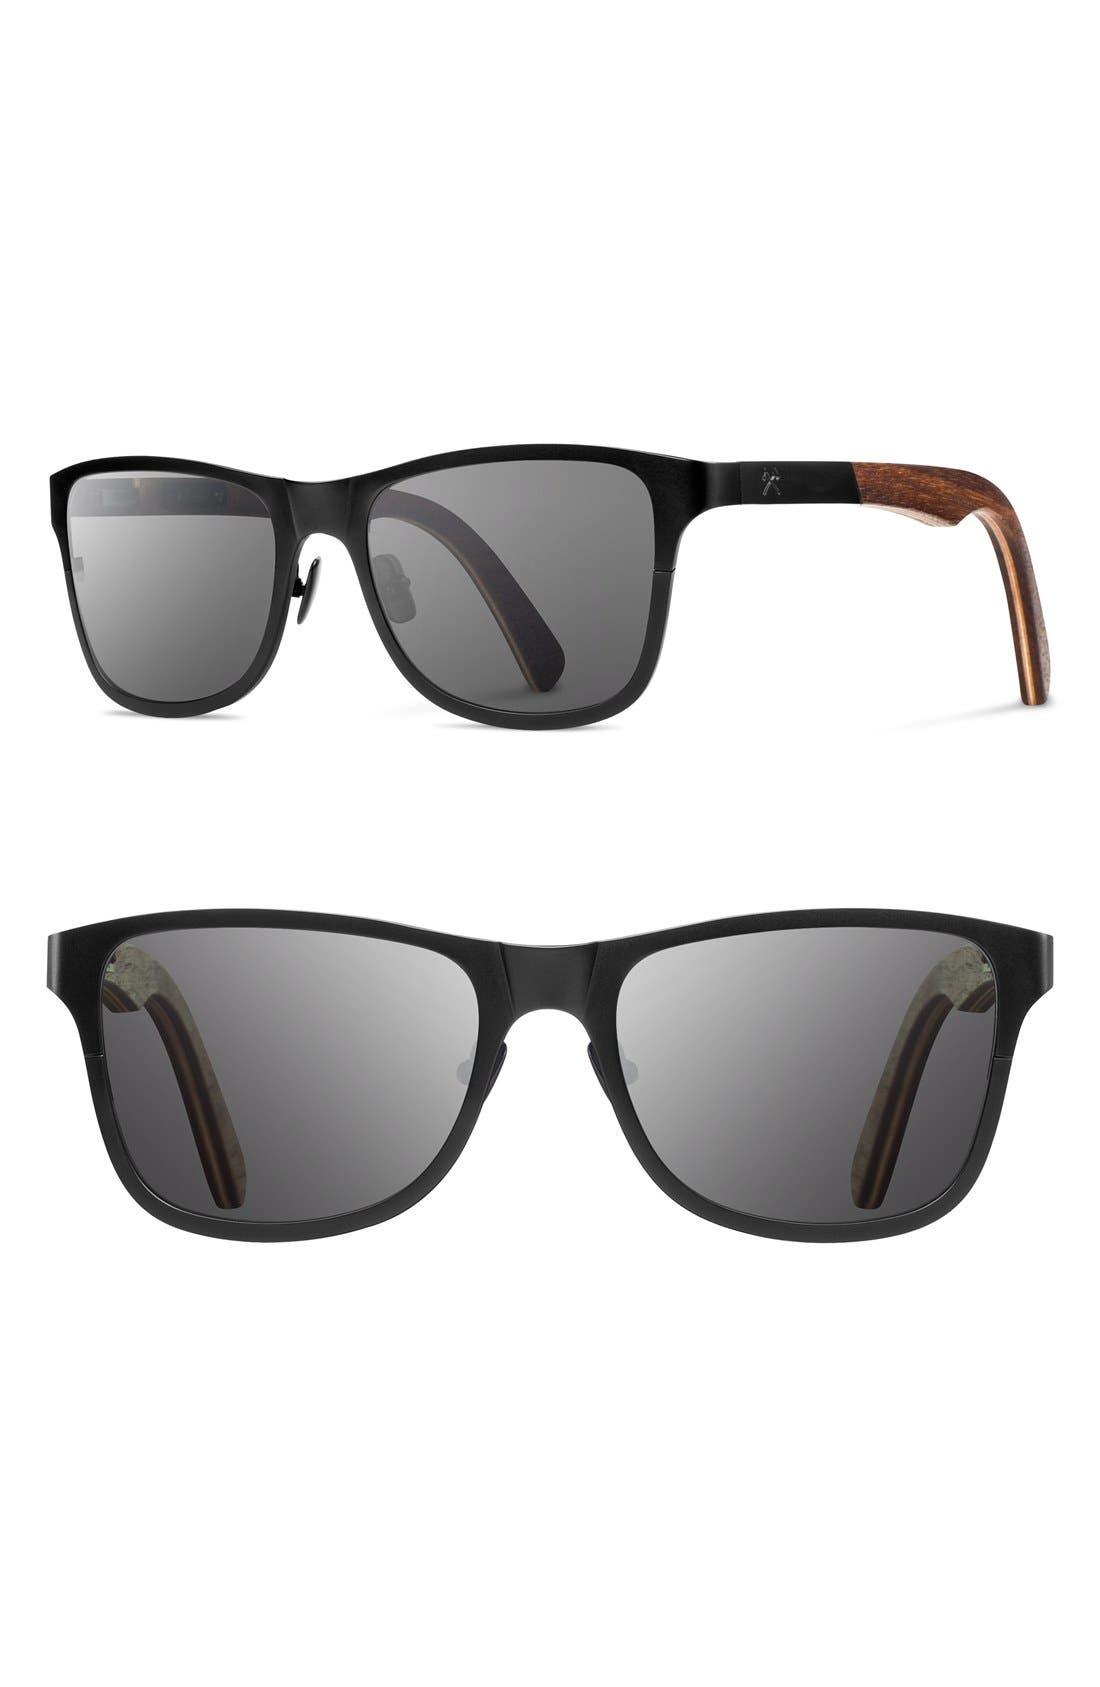 Main Image - Shwood 'Canby' 54mm Titanium & Wood Sunglasses